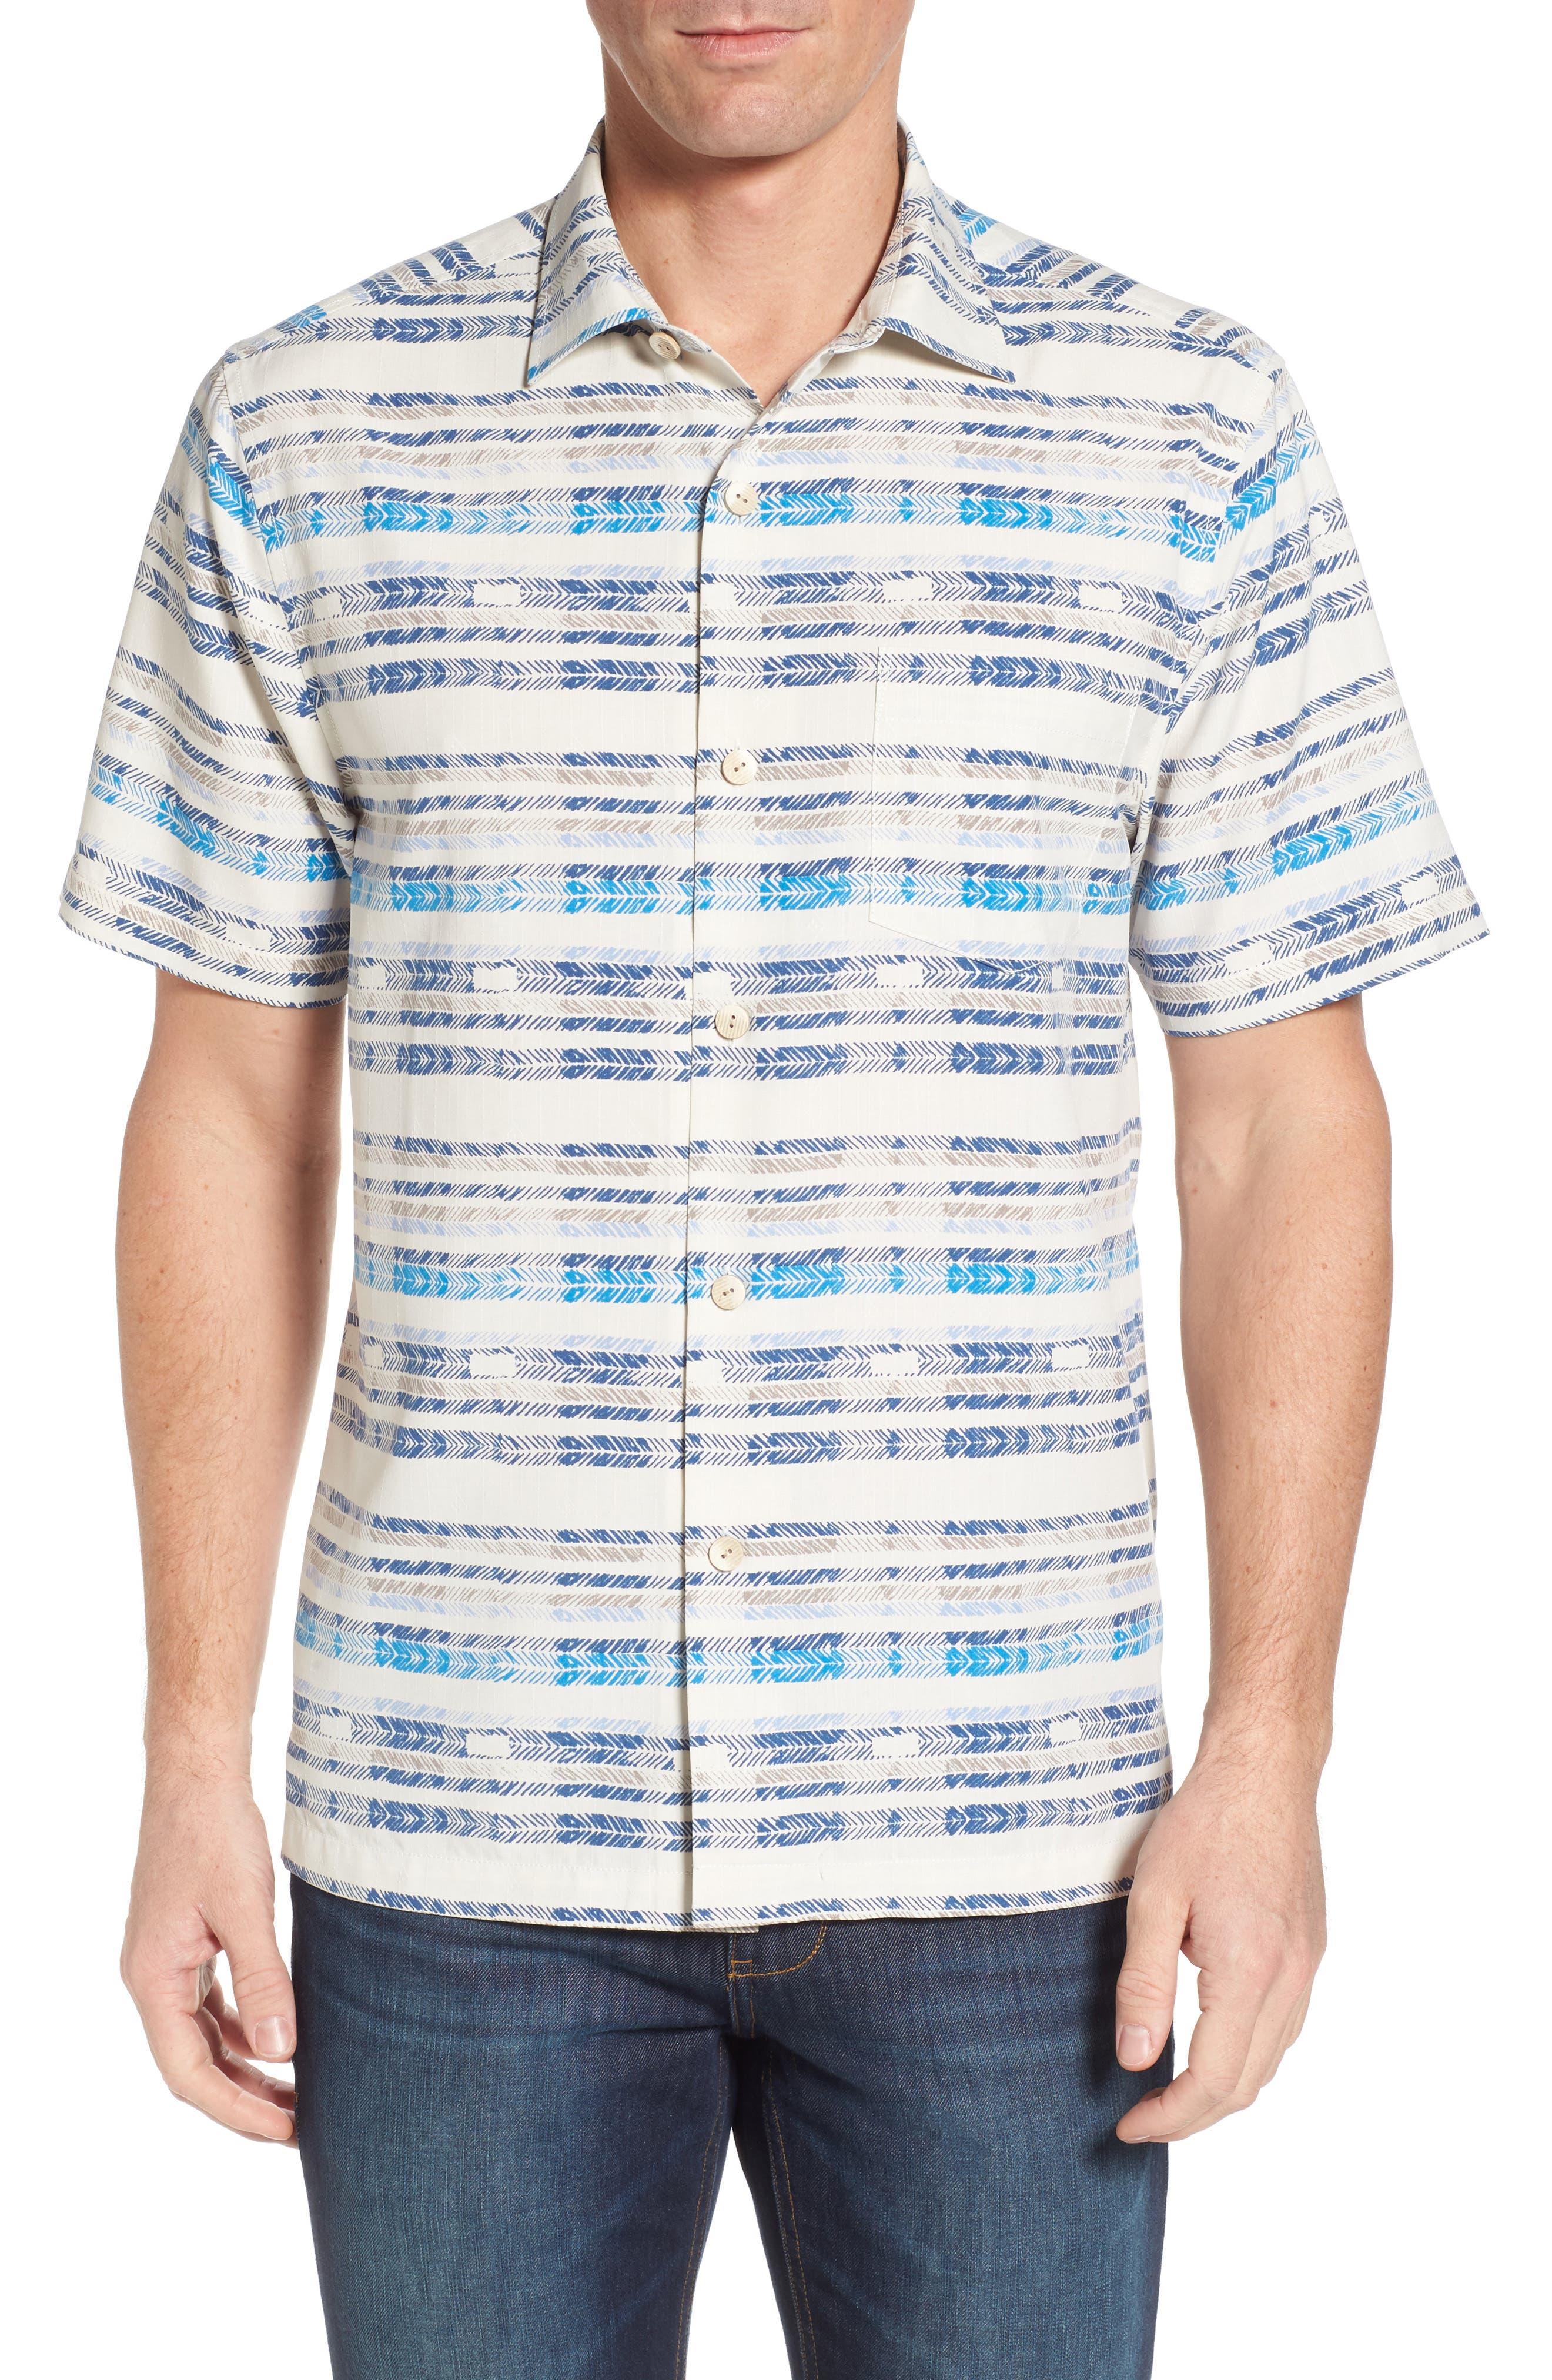 Breaker Bay Sport Shirt,                             Main thumbnail 1, color,                             Coconut Cream